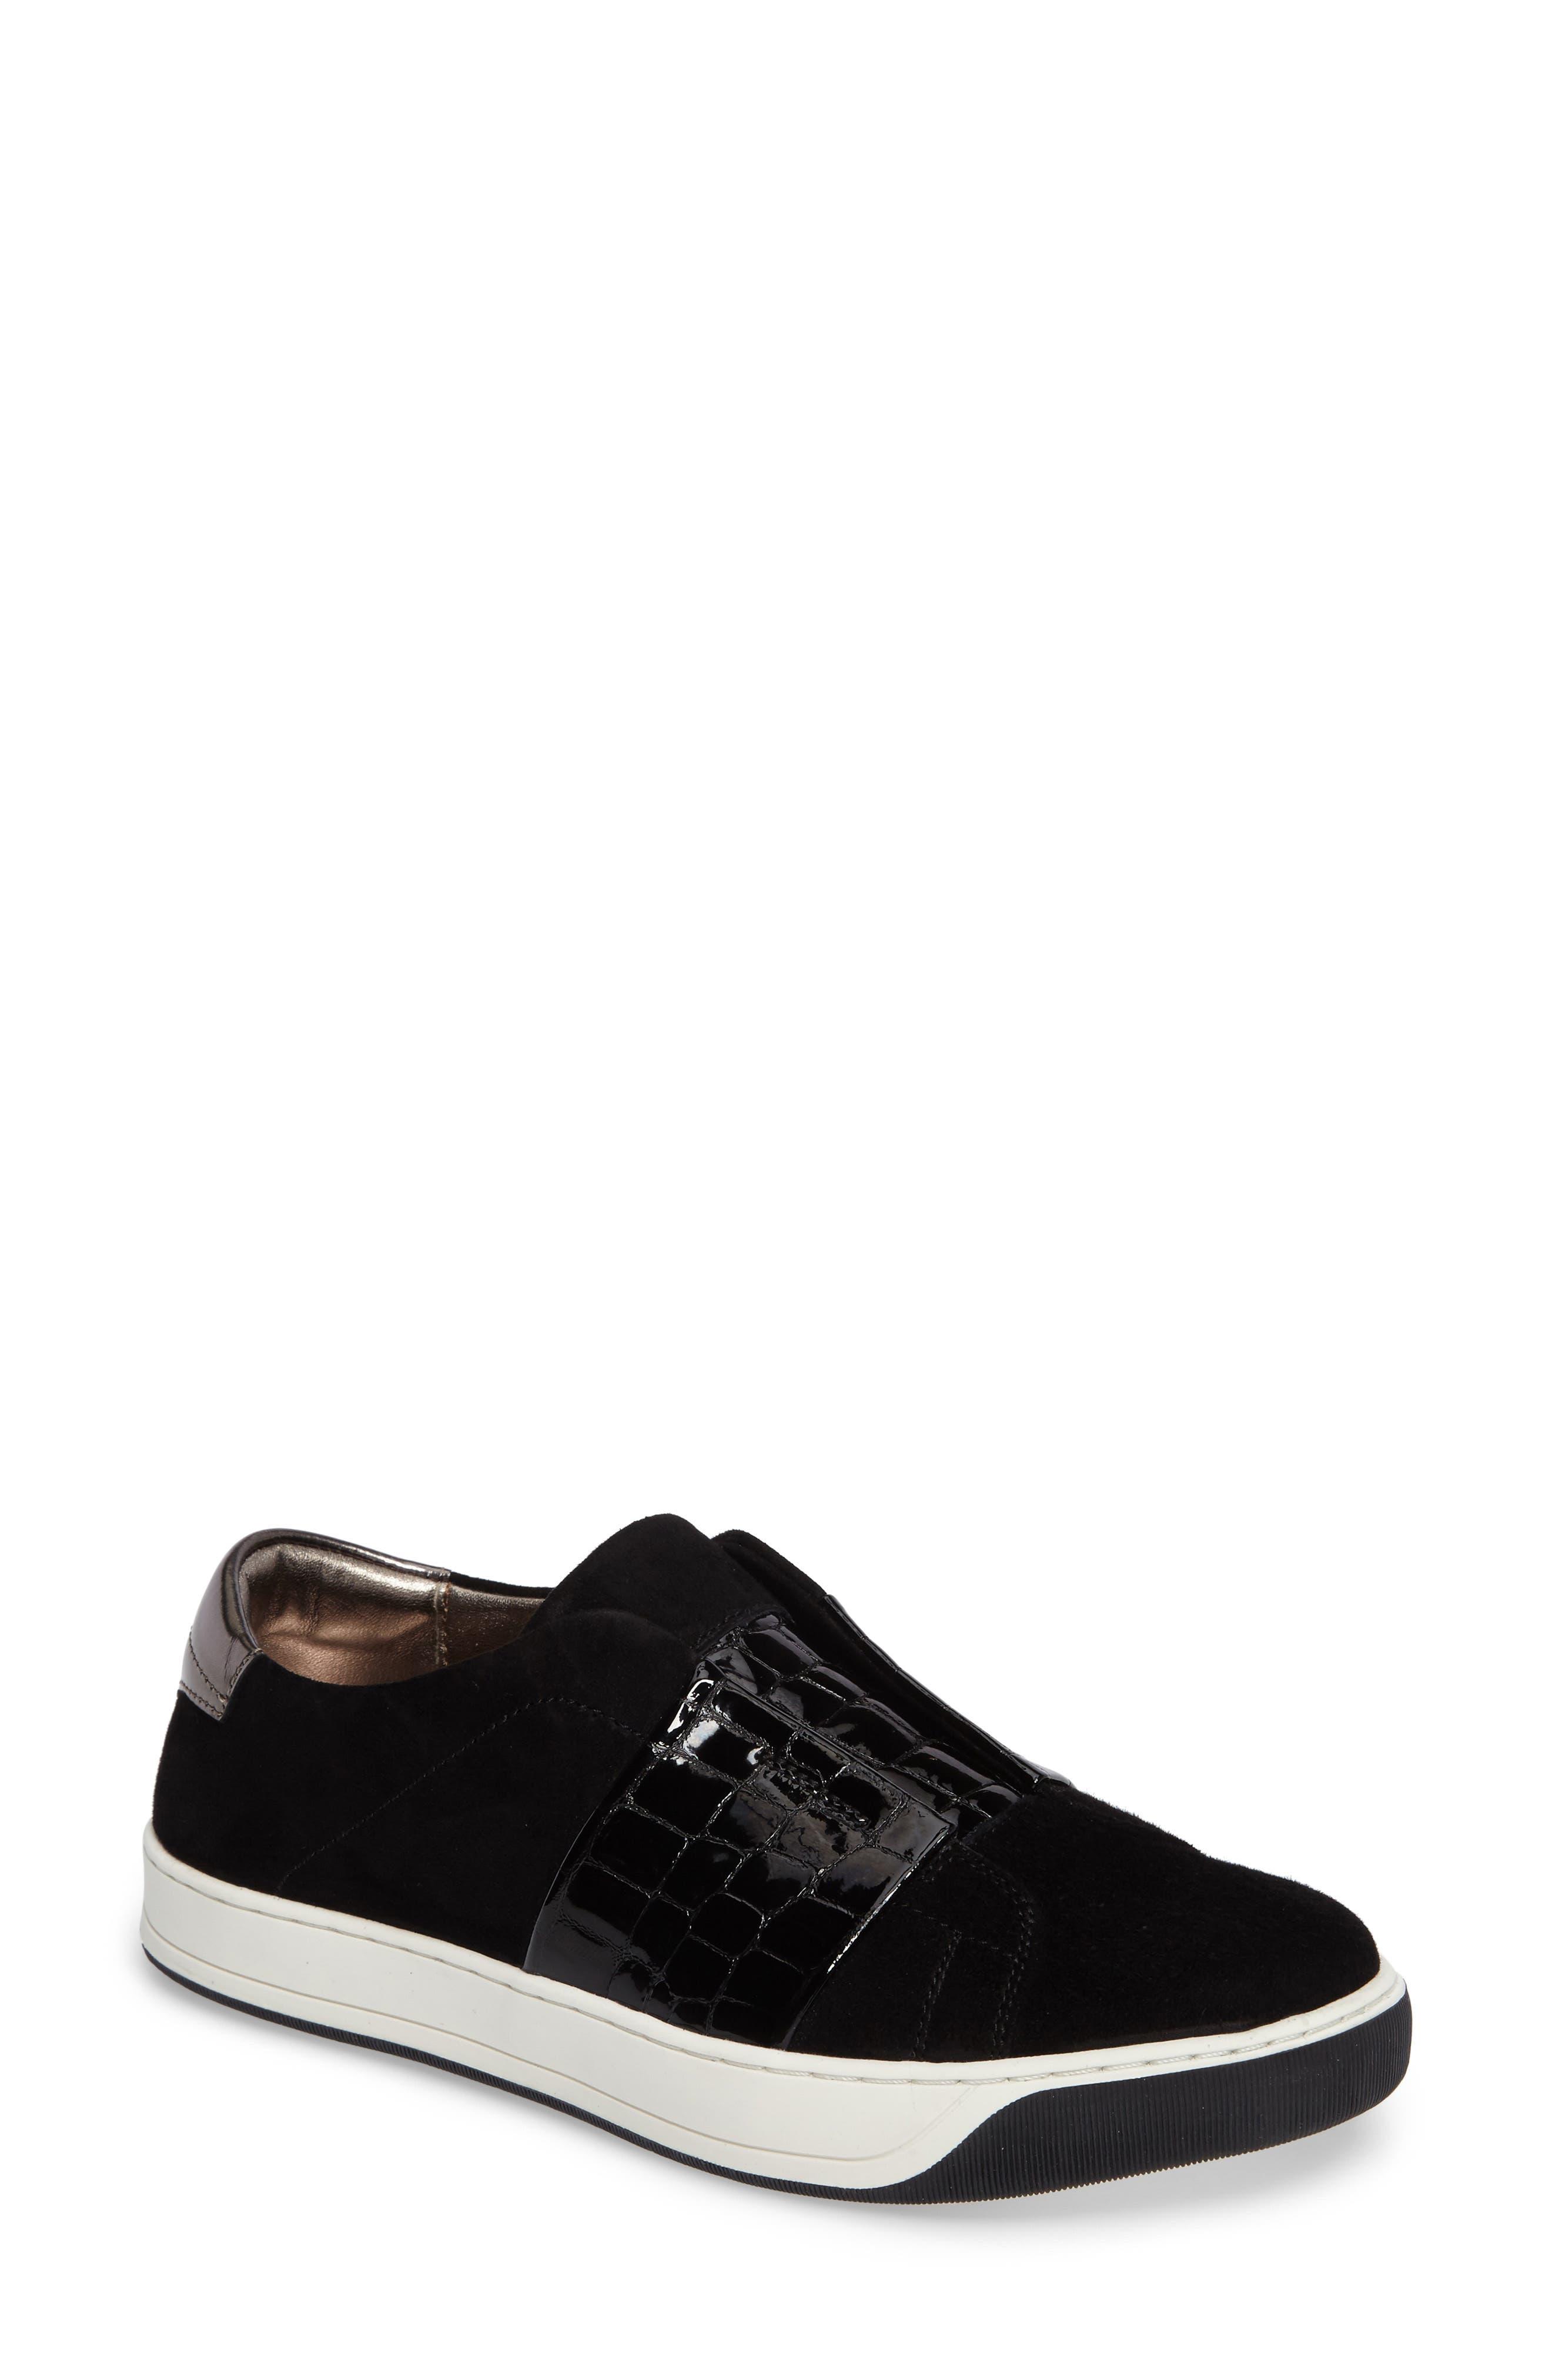 Eden Slip-On Sneaker,                             Main thumbnail 1, color,                             Black Suede